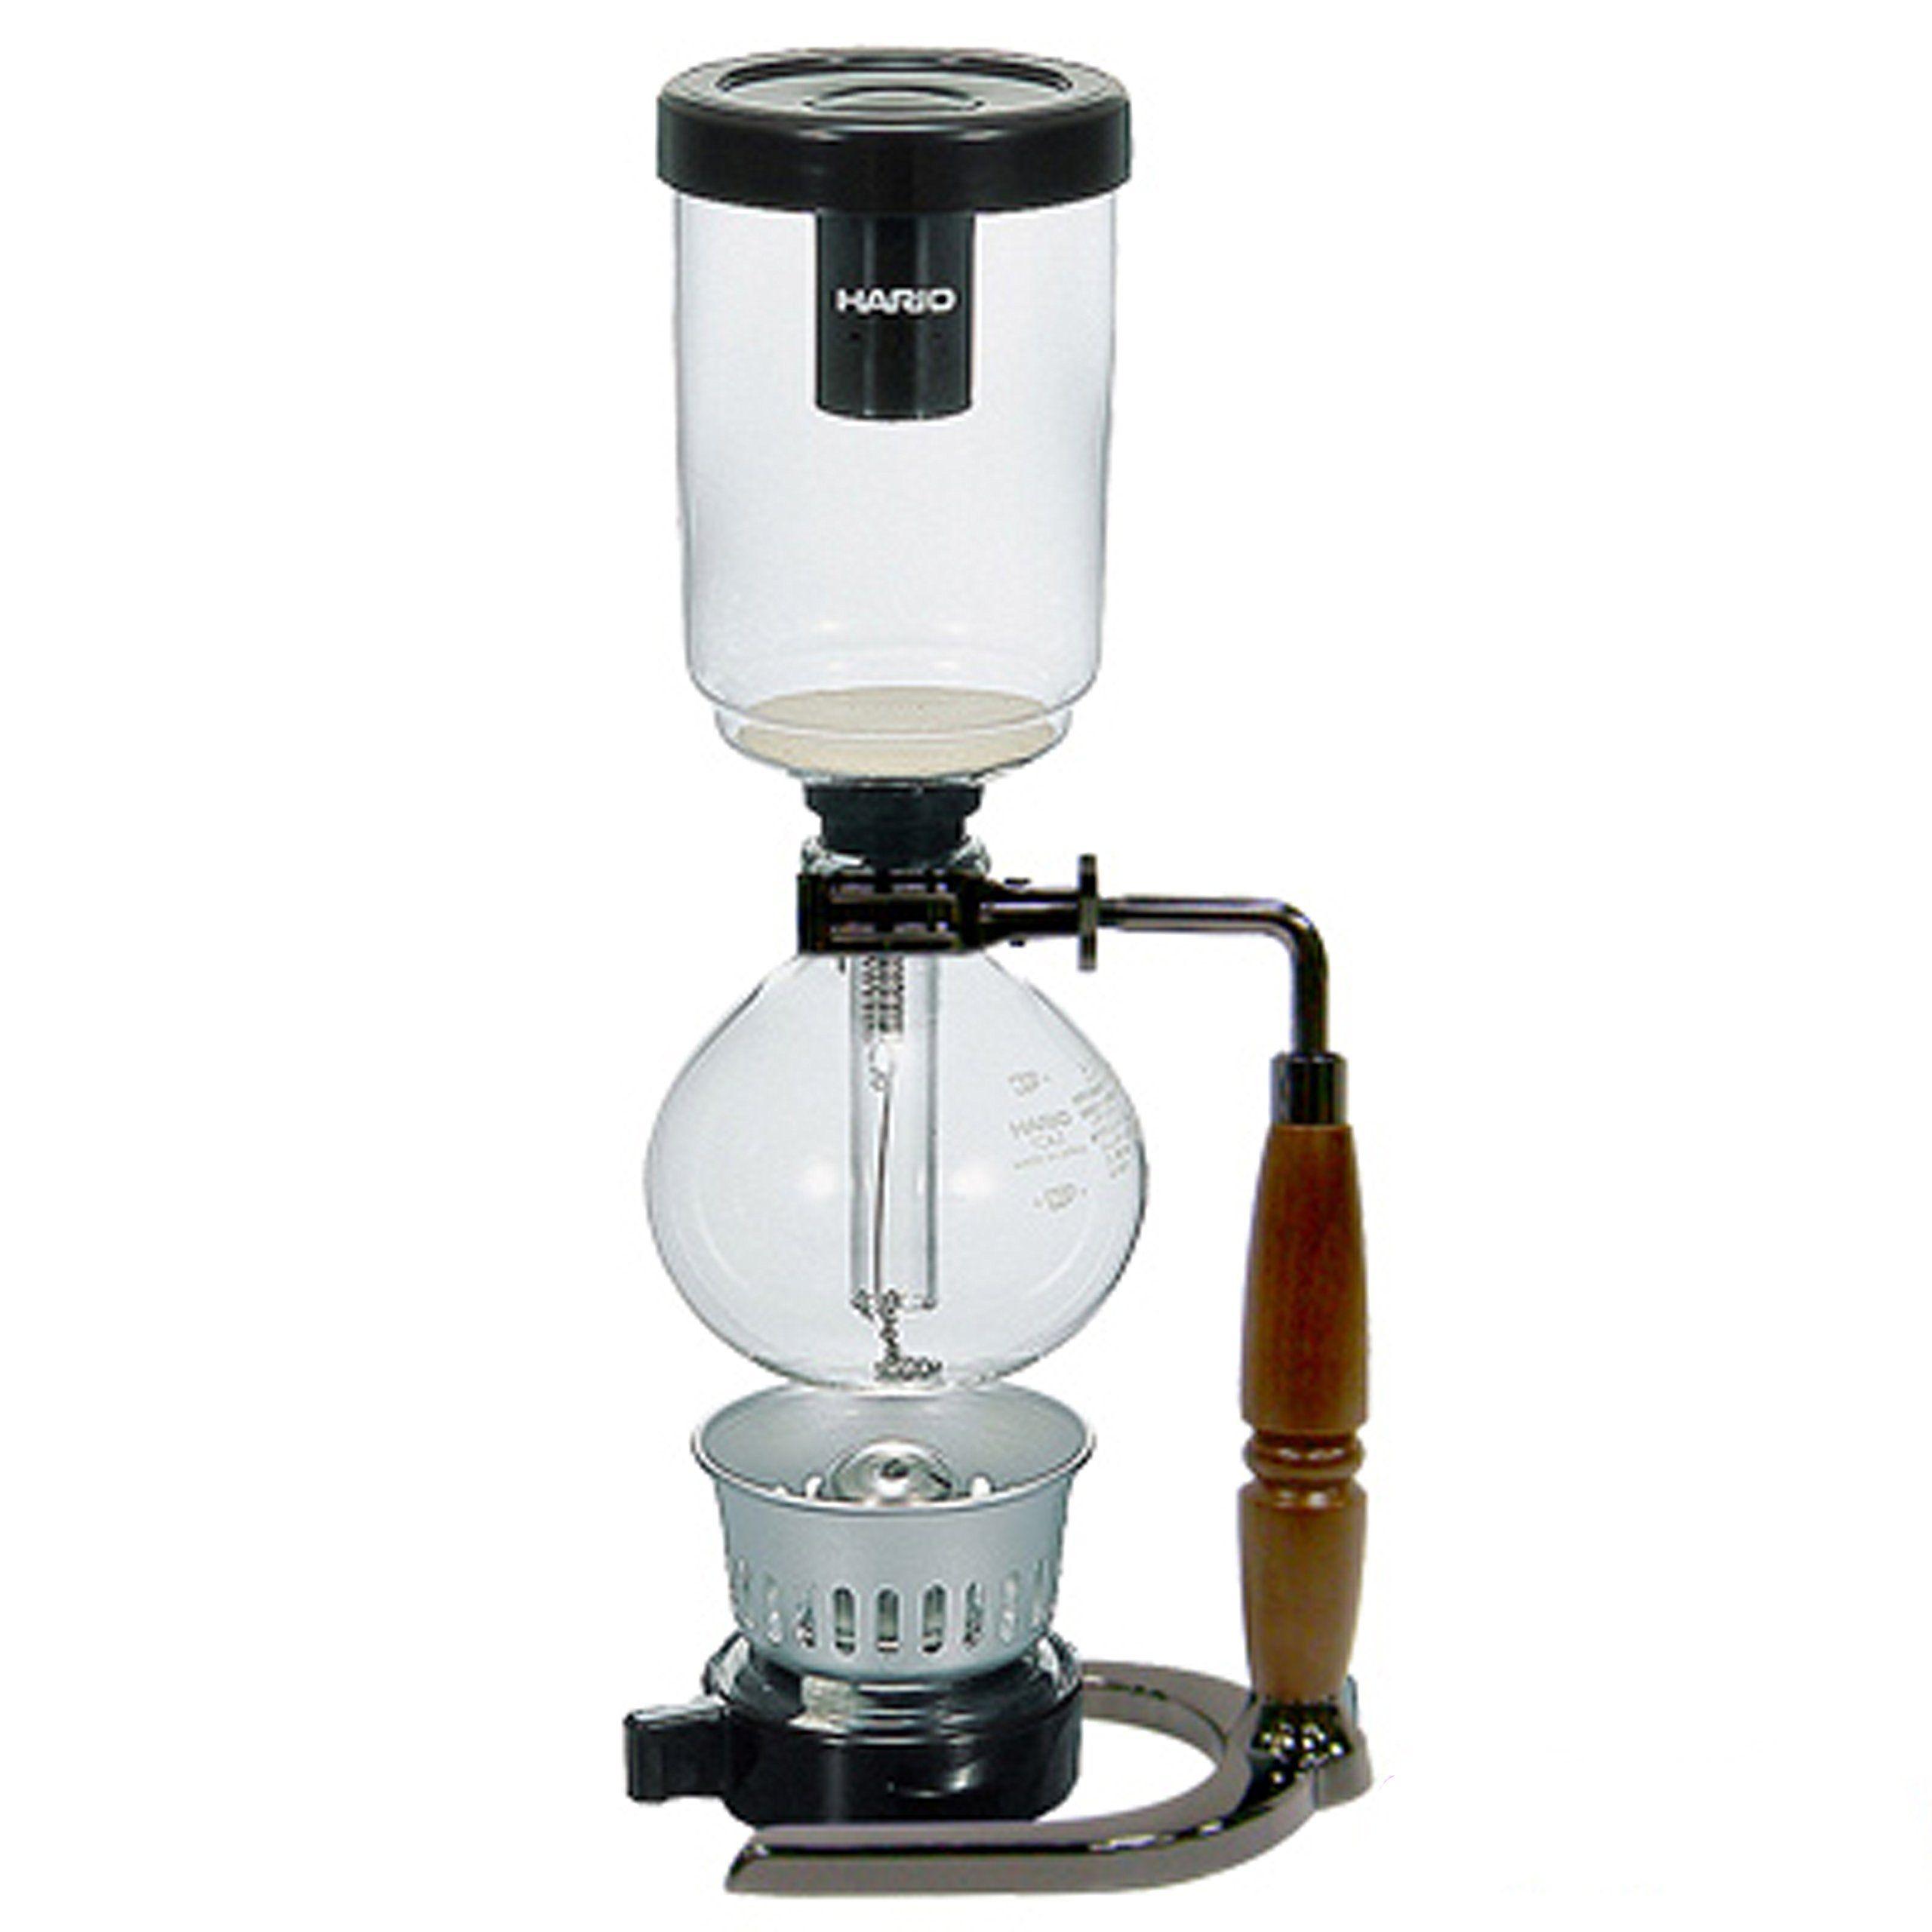 Hario Coffee Syphon Limited Edition 3Cup Gunmetal Amazon